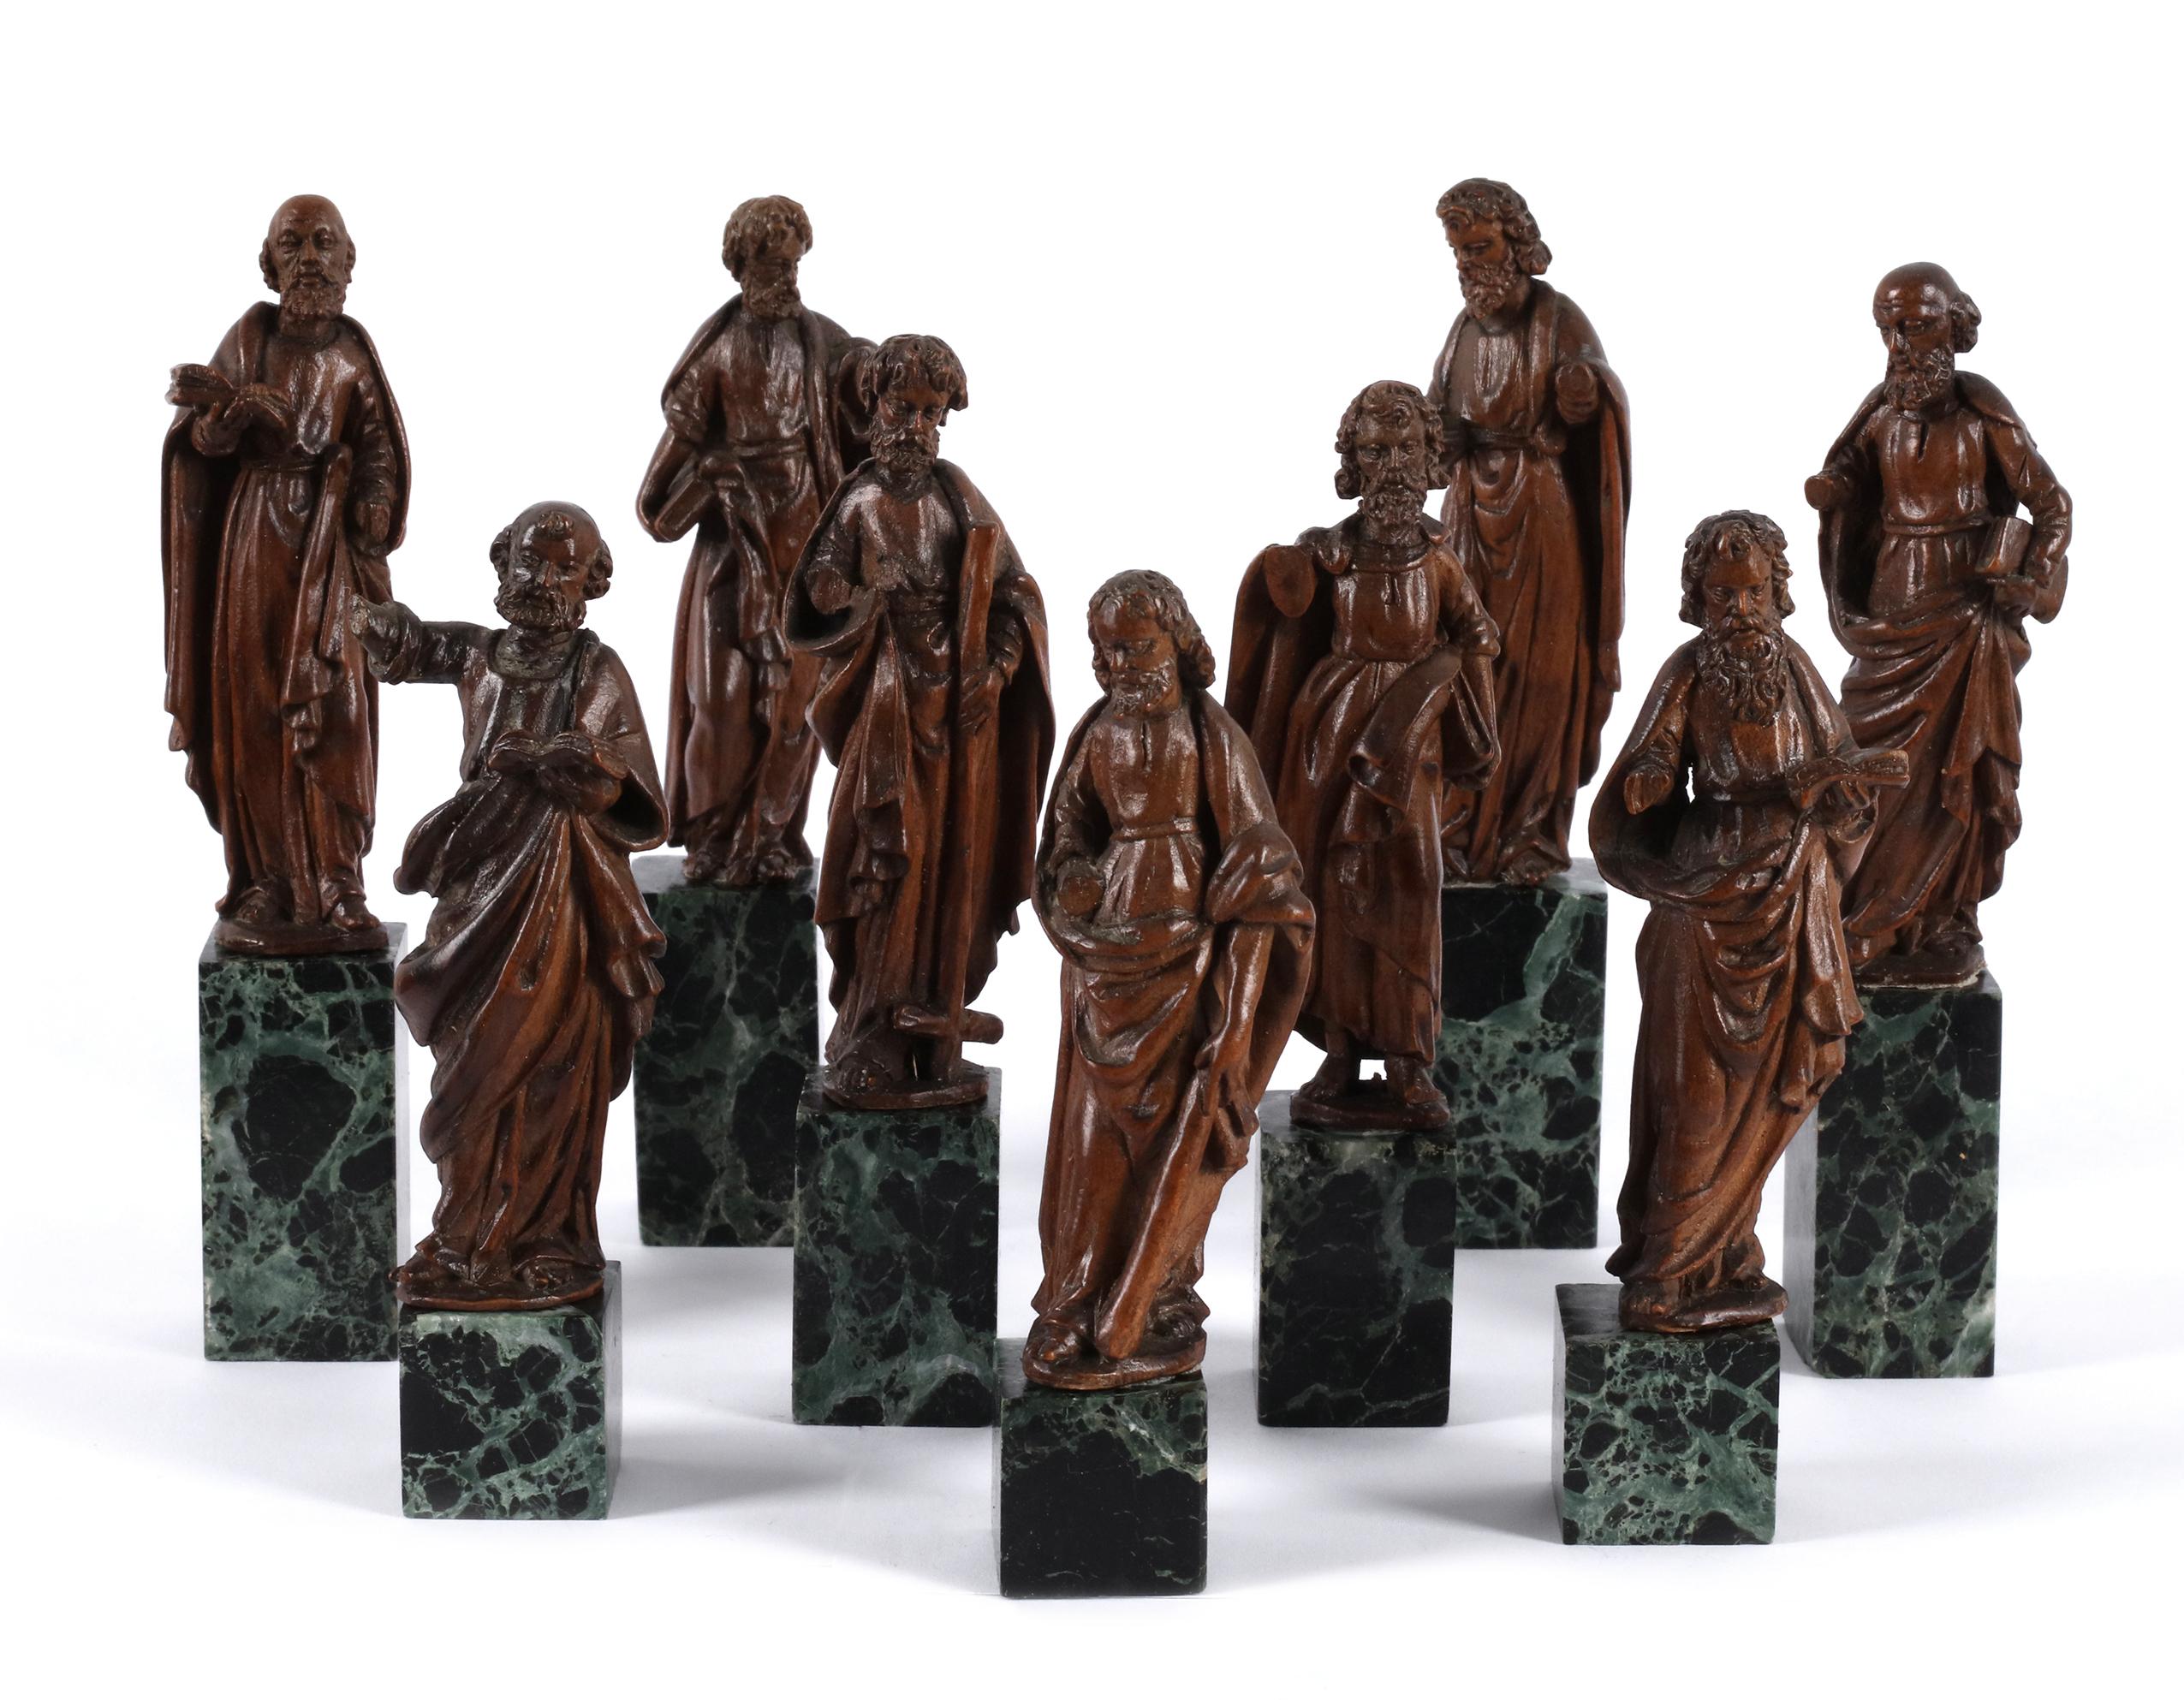 A serie of 9 apostle-sculptures